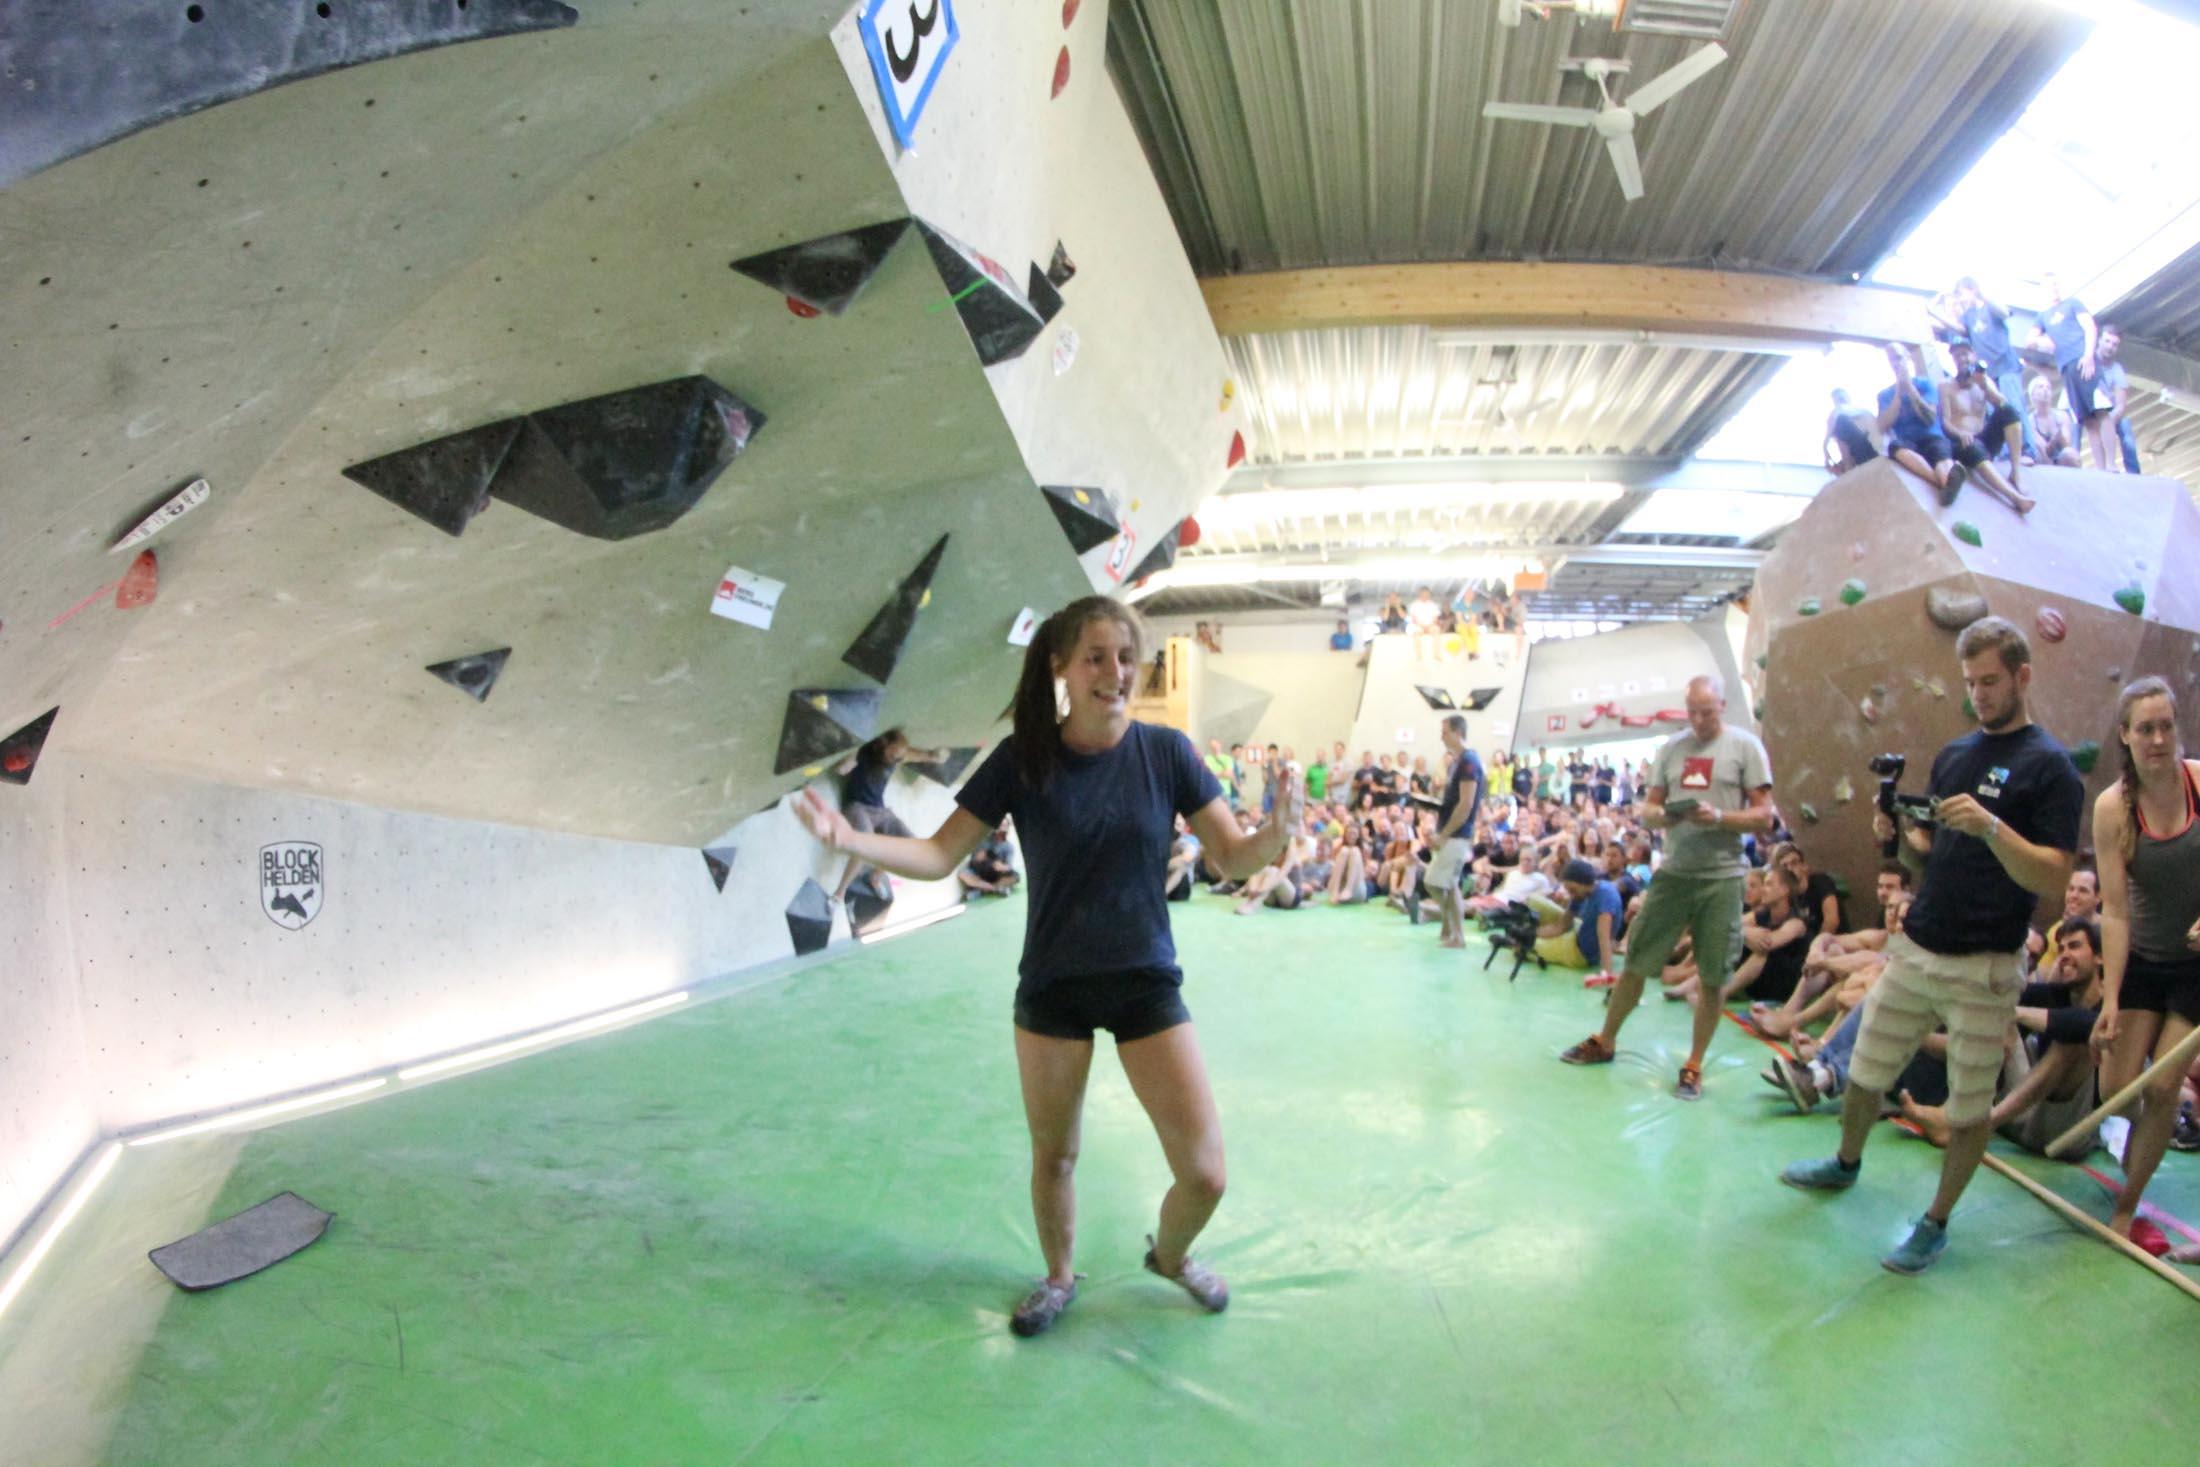 Finale, internationaler bouldercup Frankenjura 2016, BLOCKHELDEN Erlangen, Mammut, Bergfreunde.de, Boulderwettkampf07092016679